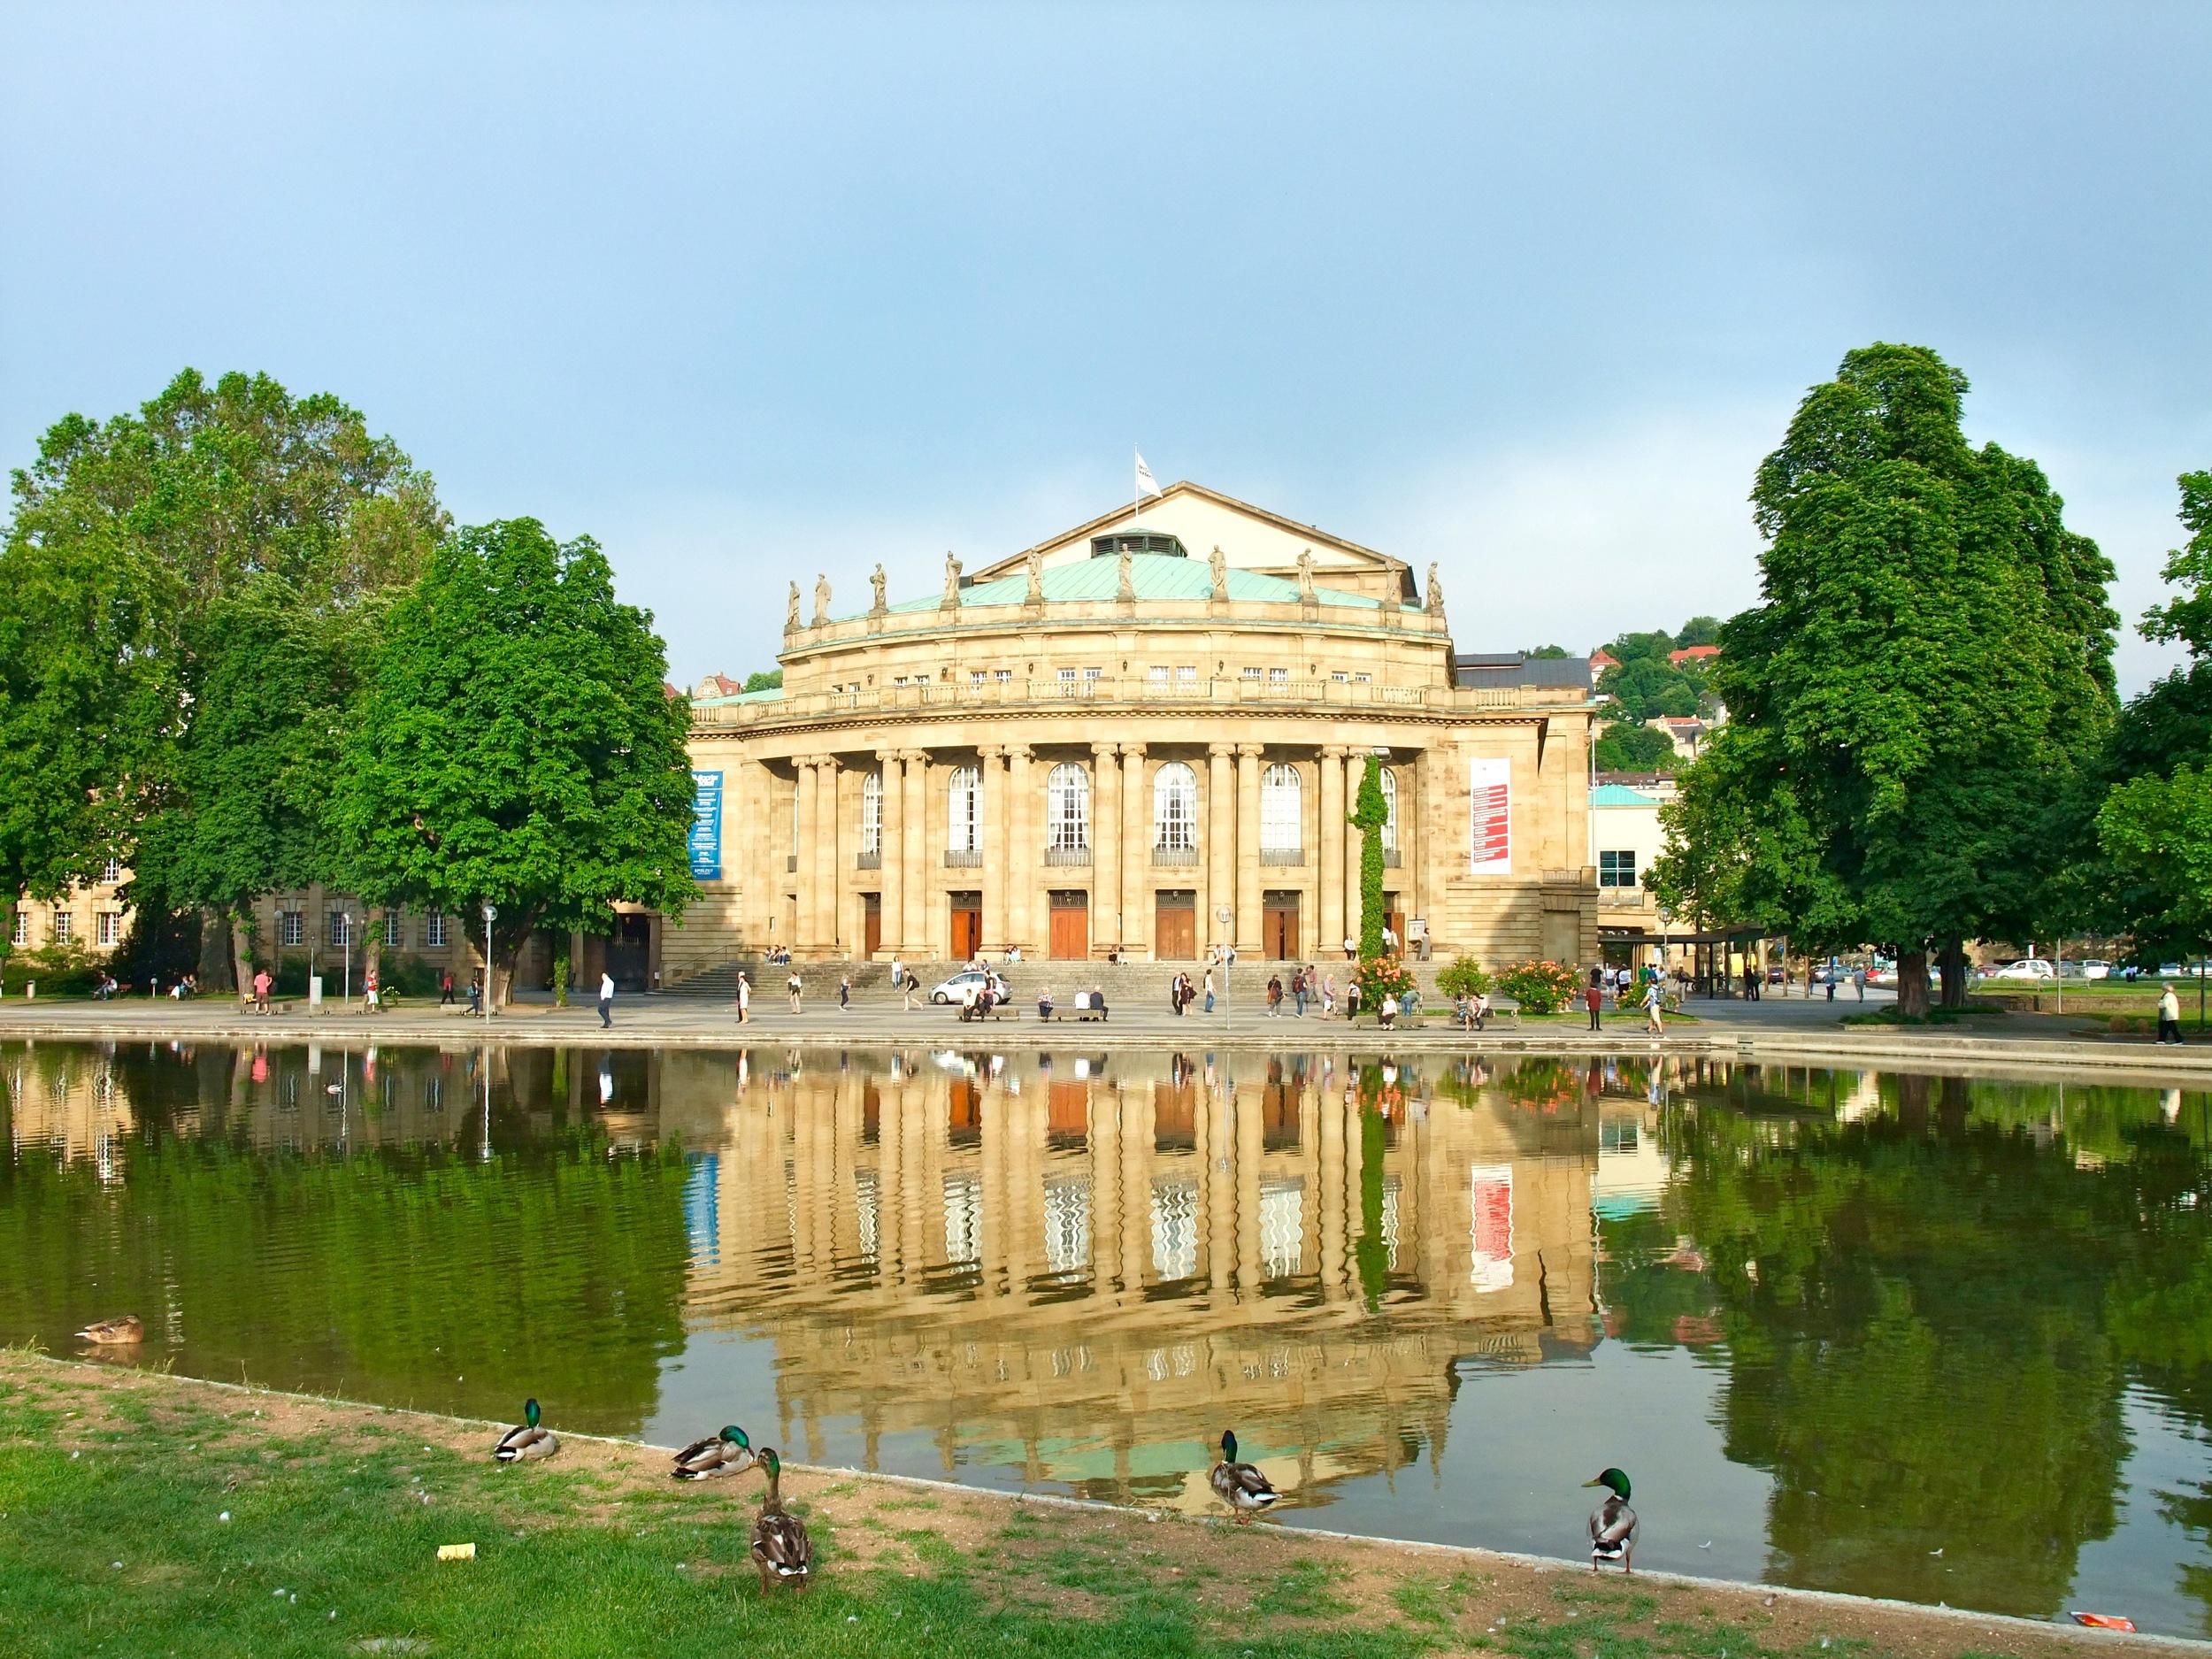 The opera house in the Schlossgarten